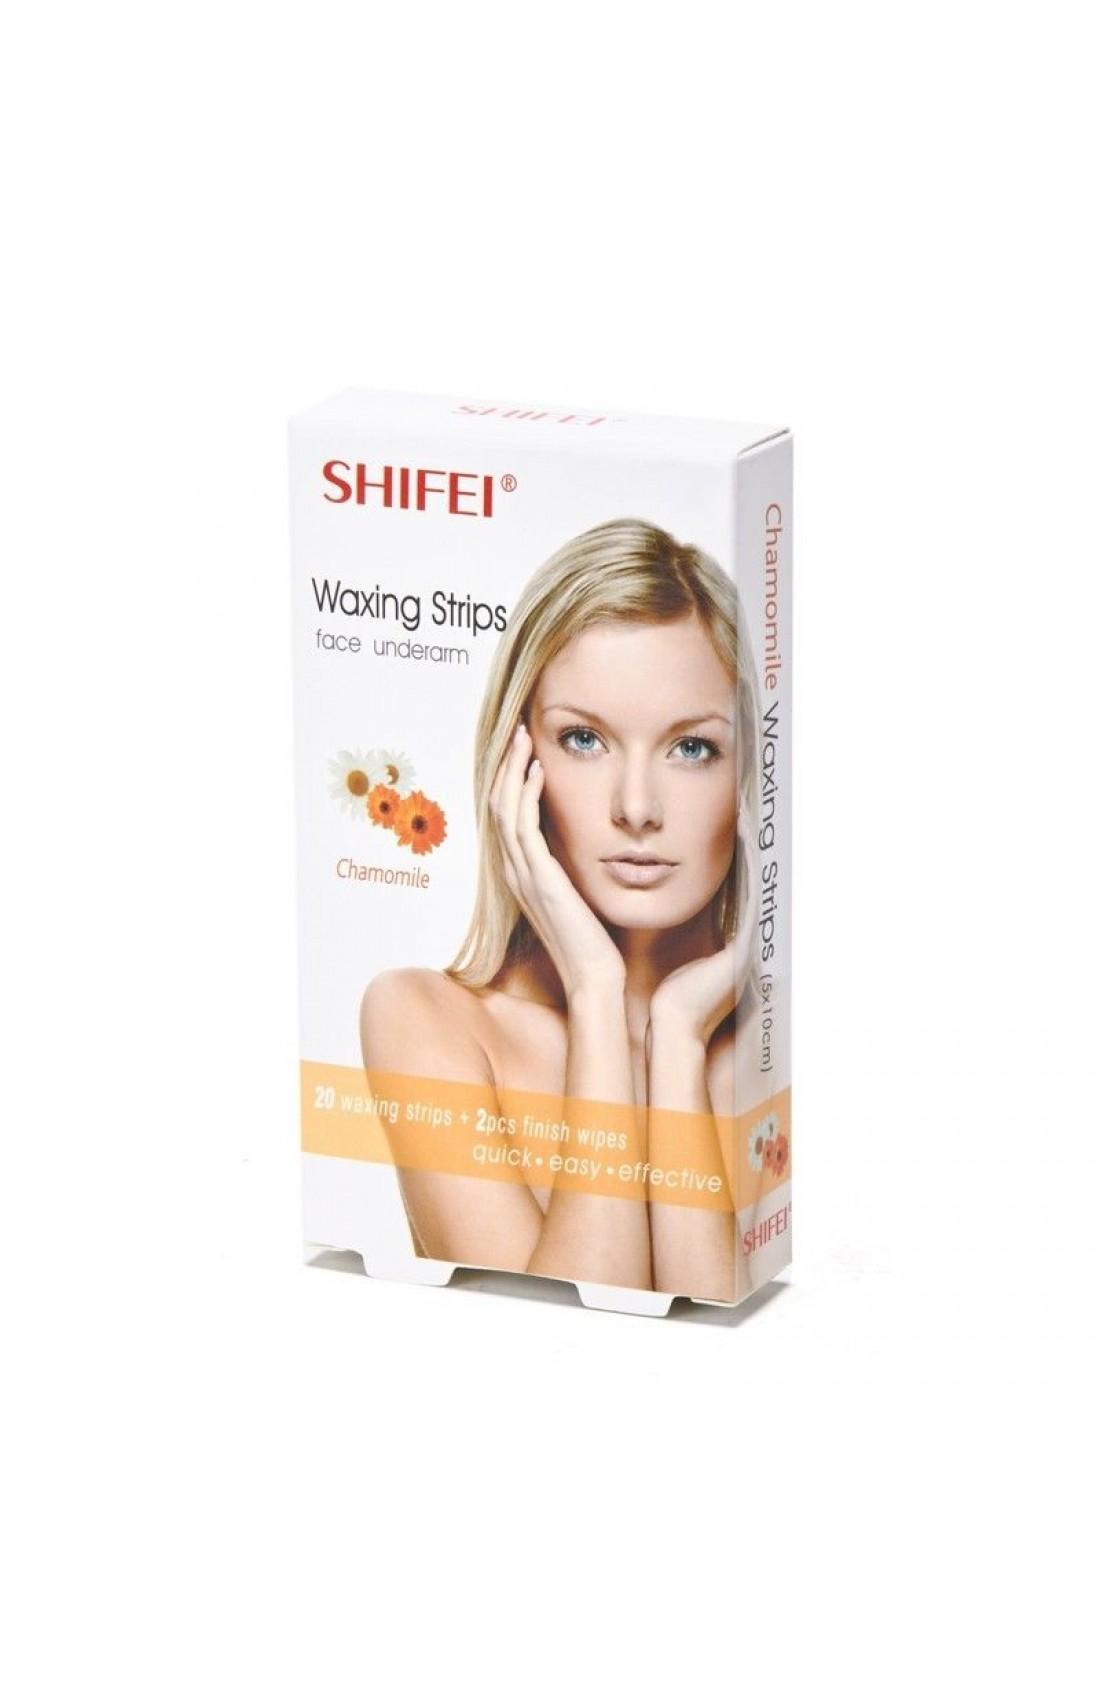 SHIFEI Chamomile Facial Cold Wax Strips